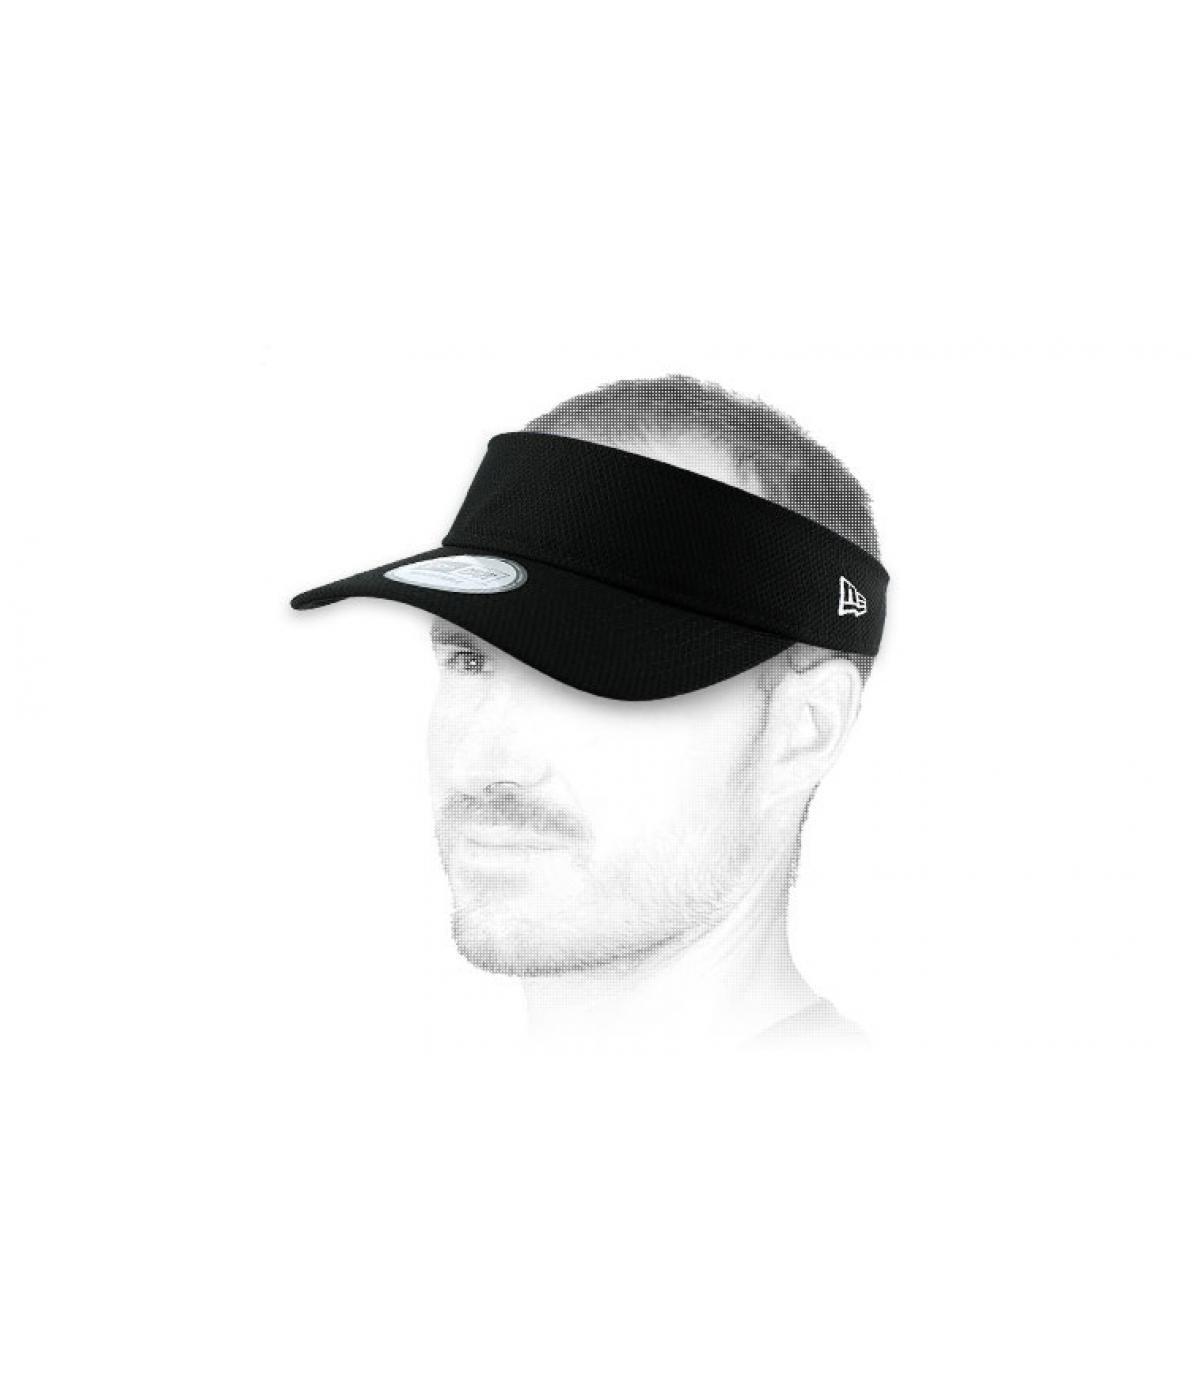 new era visor sport